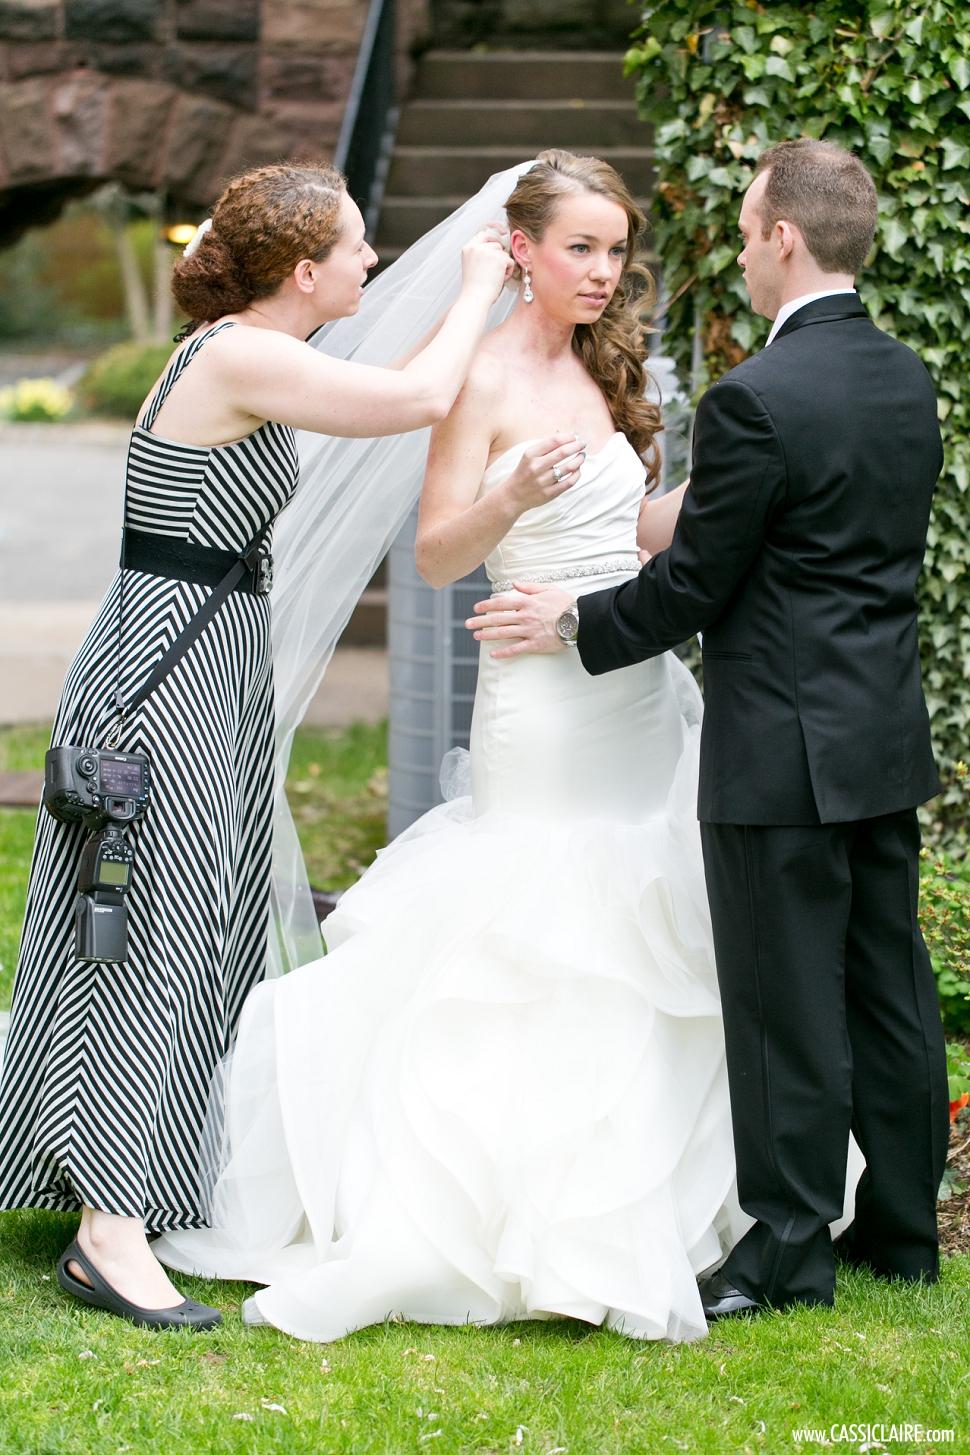 Hamilton-Park-Hotel-Wedding_Cassi-Claire_018.jpg